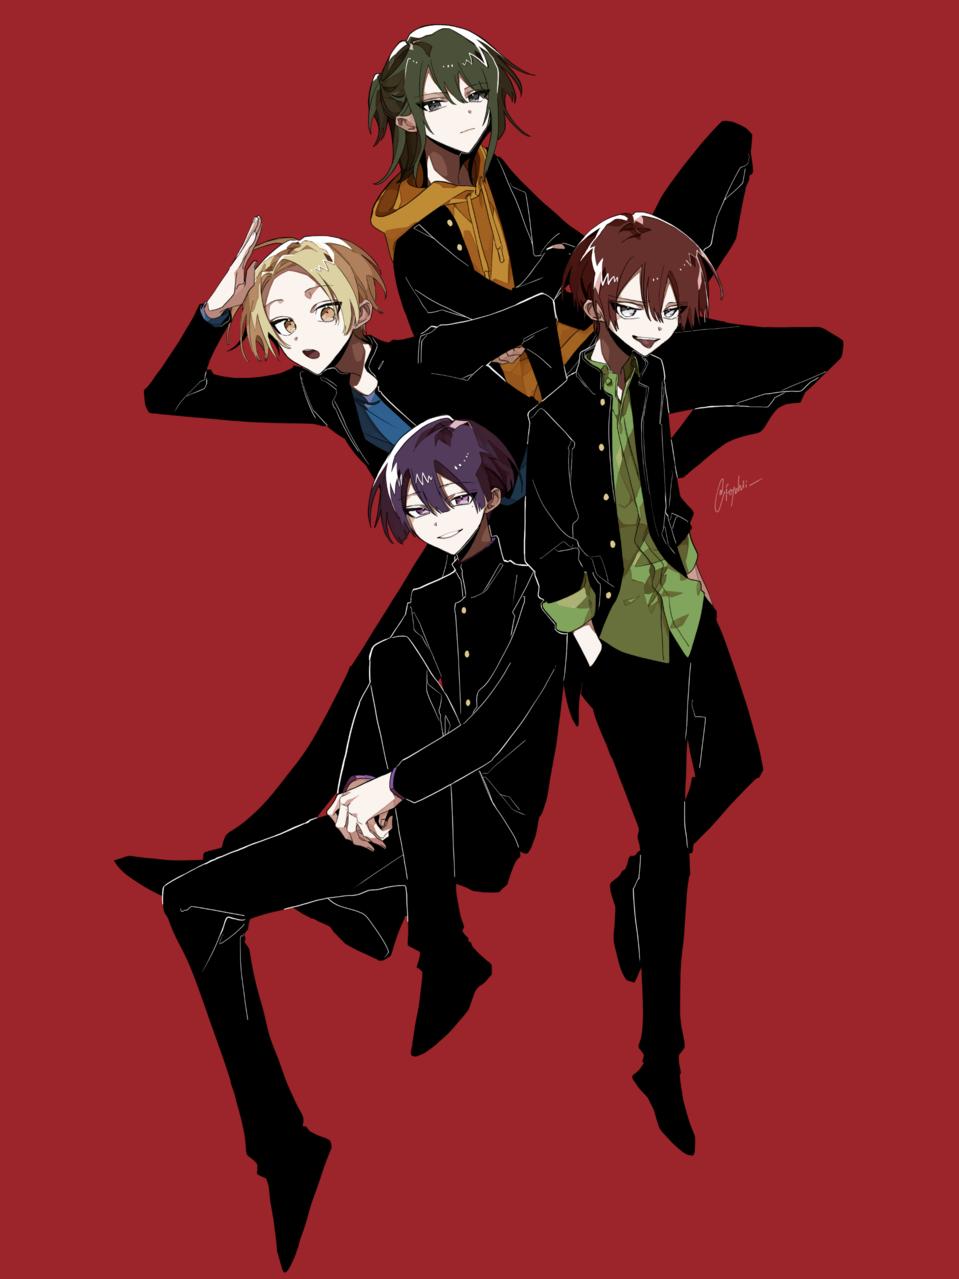 Illust of もと boy art oc original オリジナル創作